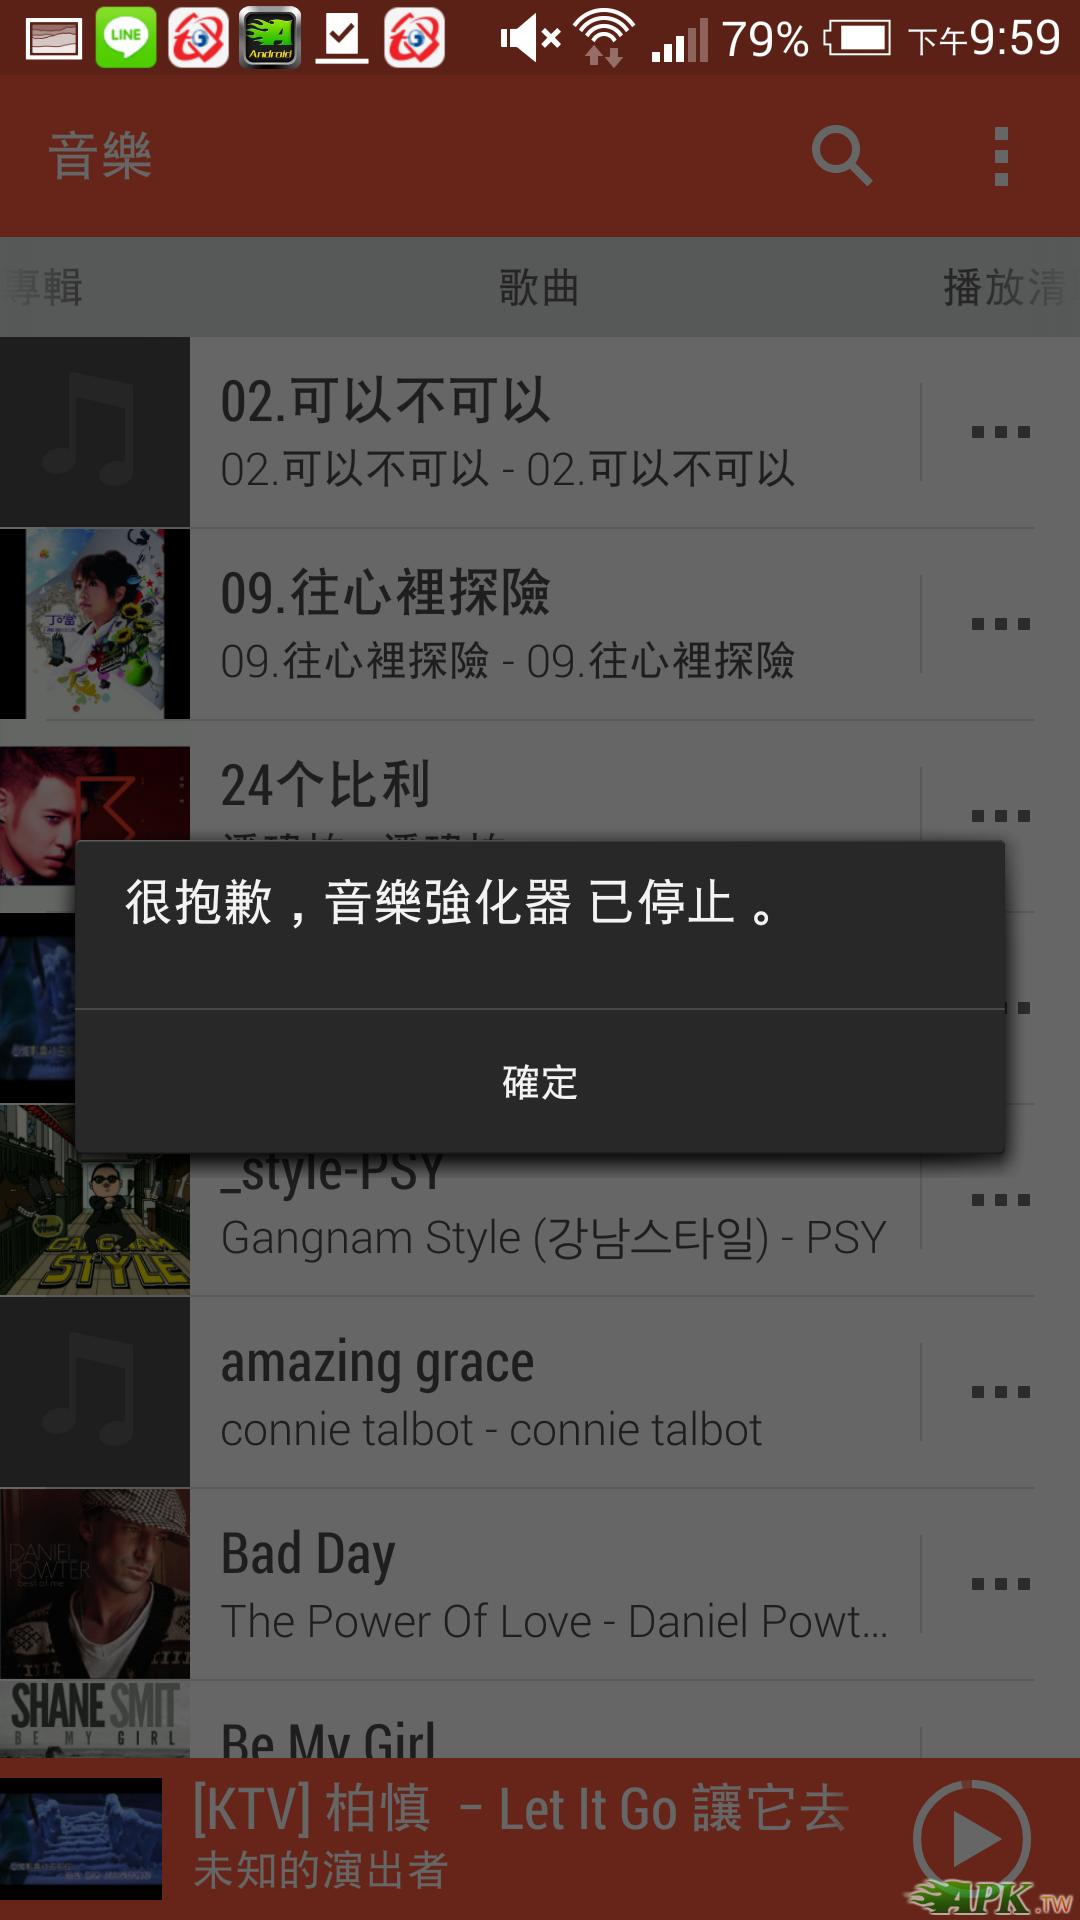 Screenshot_2014-06-30-21-59-09.png